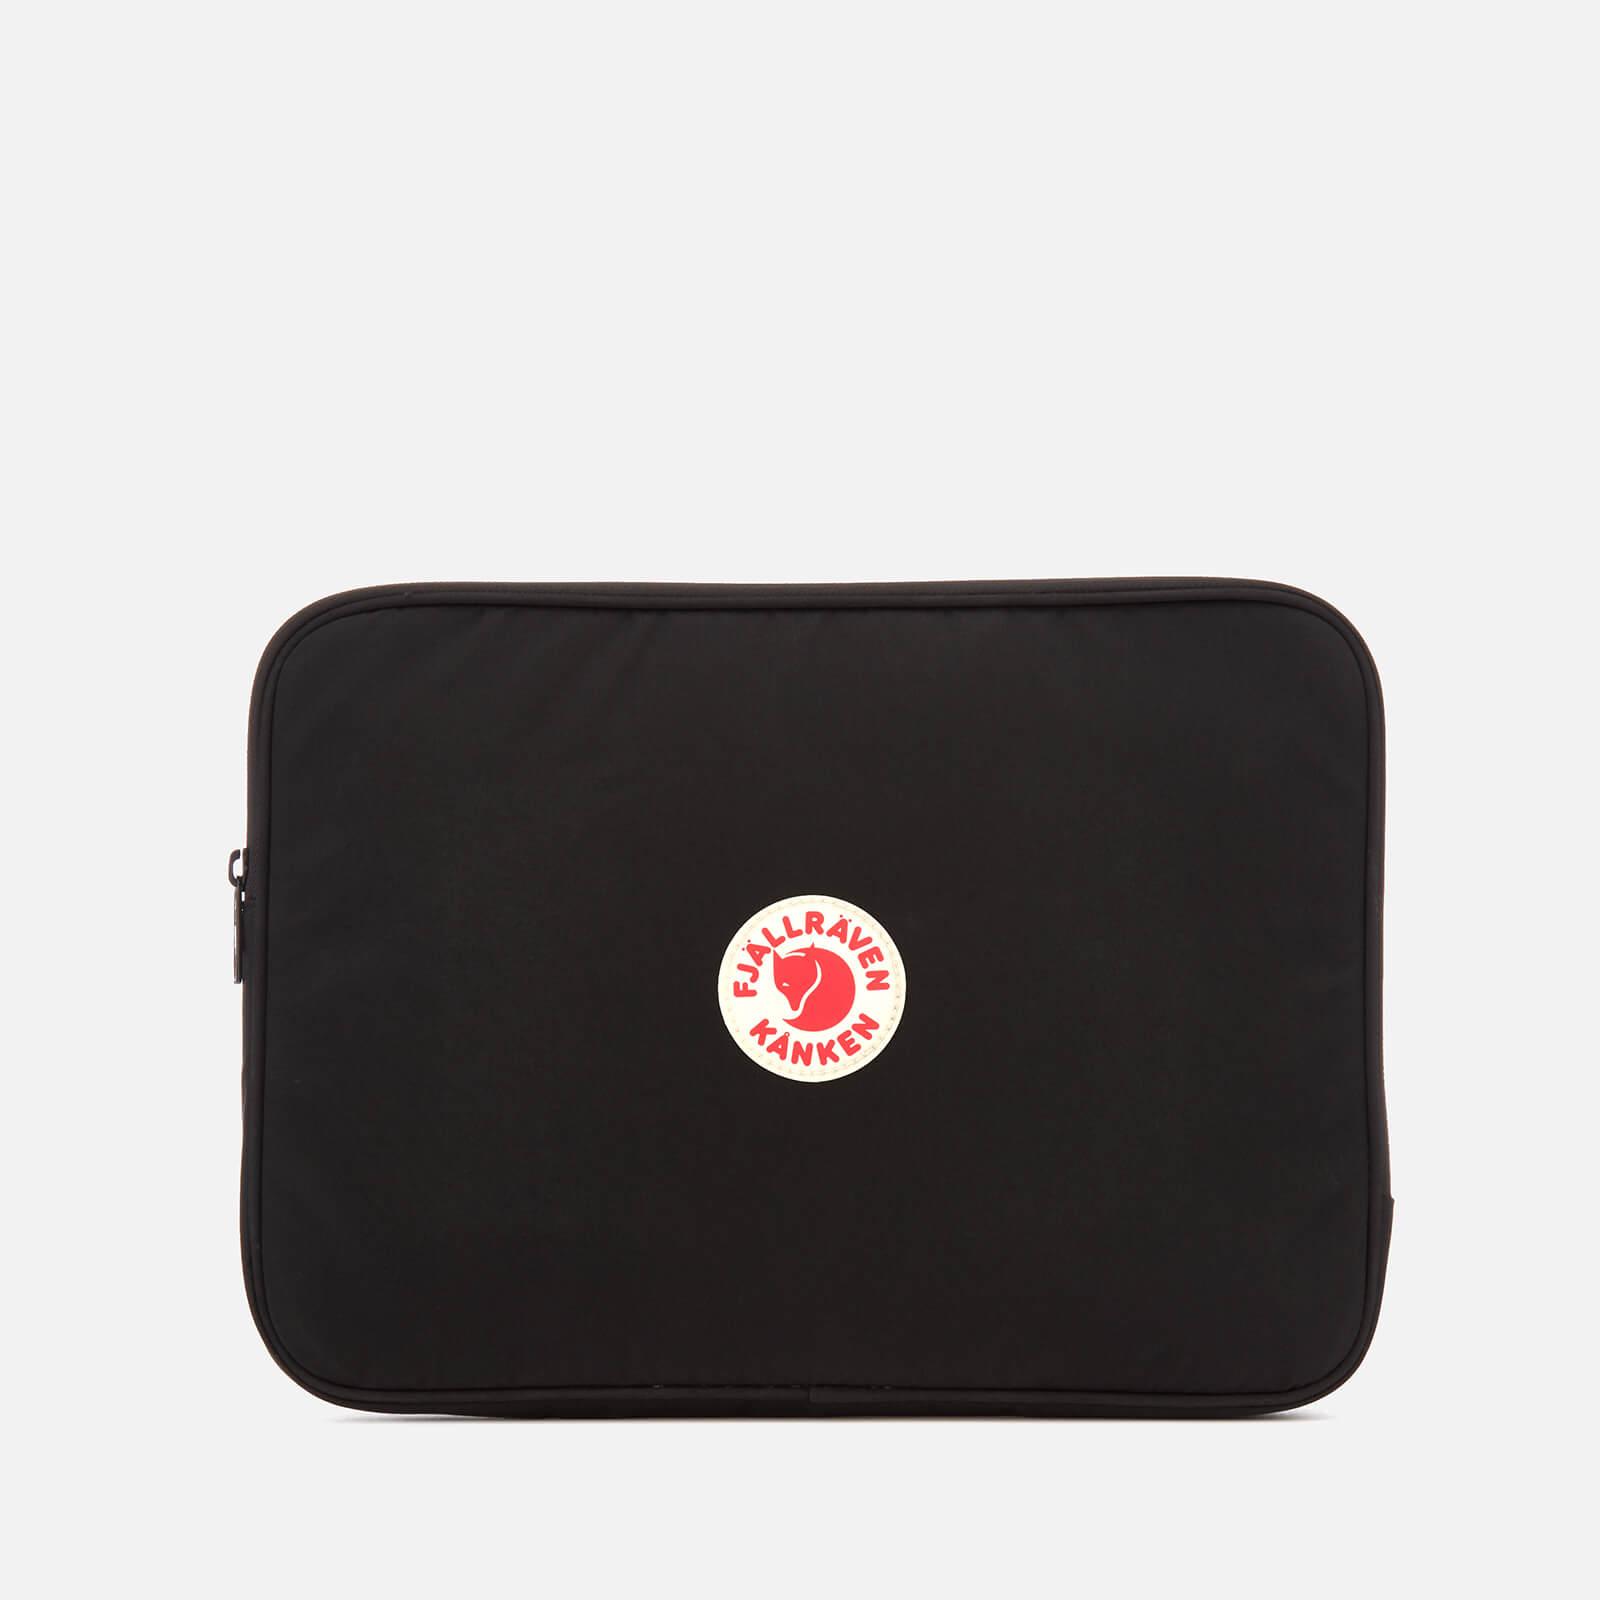 Fjallraven Kanken Laptop Case 13  - Black